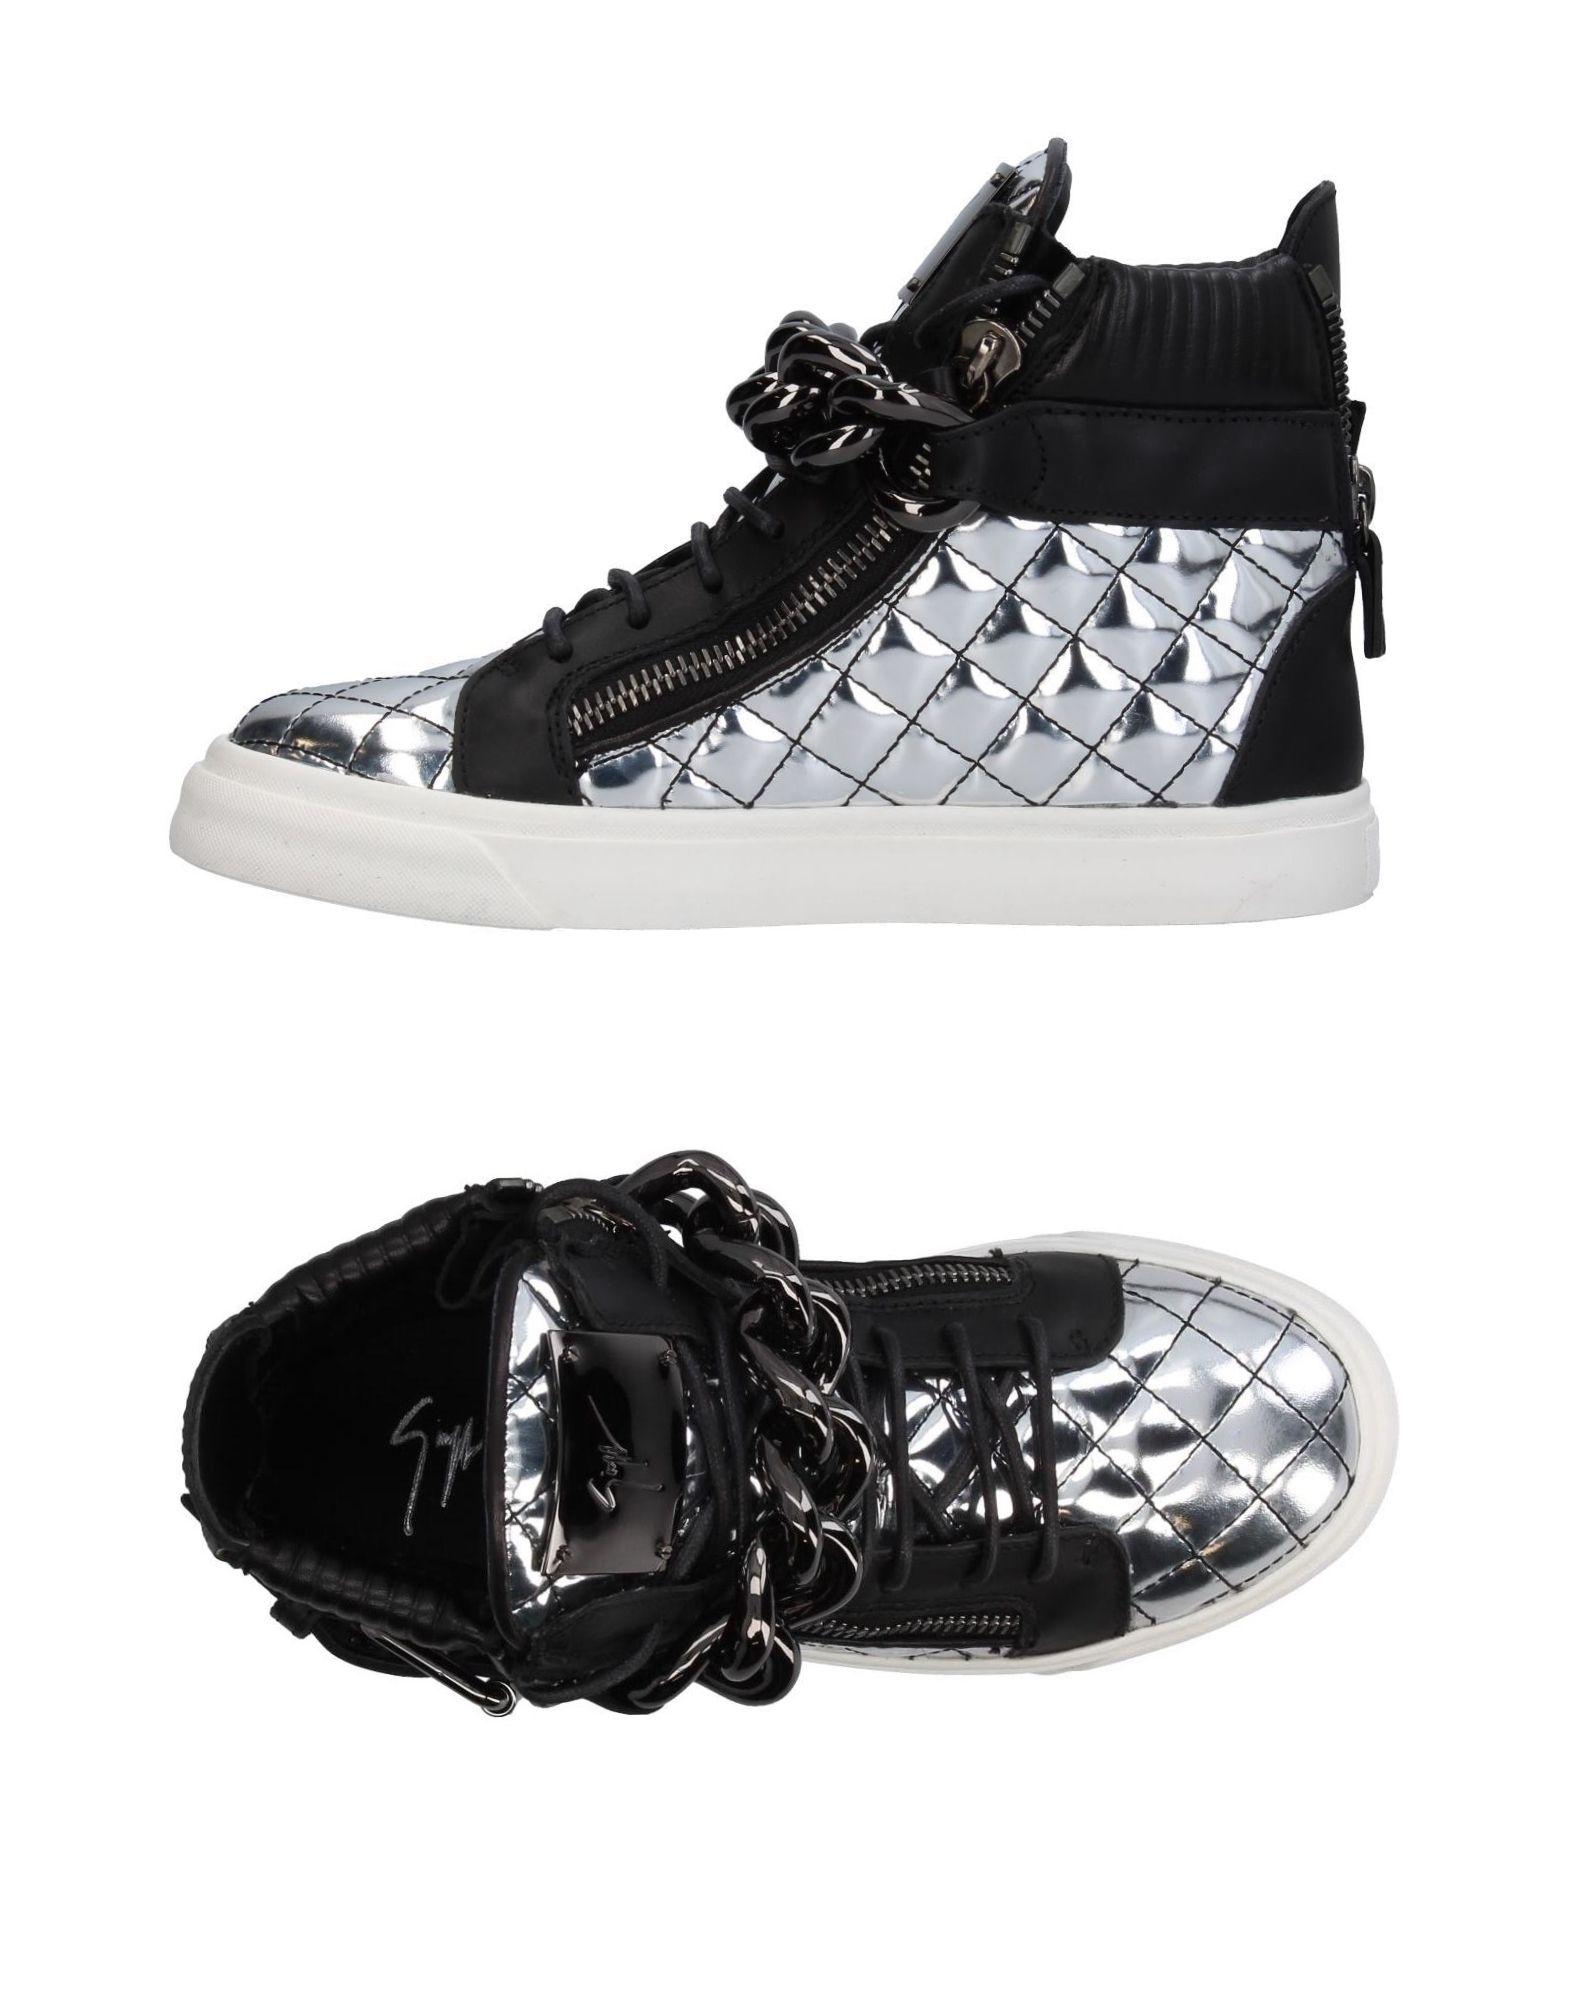 Giuseppe Zanotti Sneakers Damen  Schuhe 11386379JLGut aussehende strapazierfähige Schuhe  138941